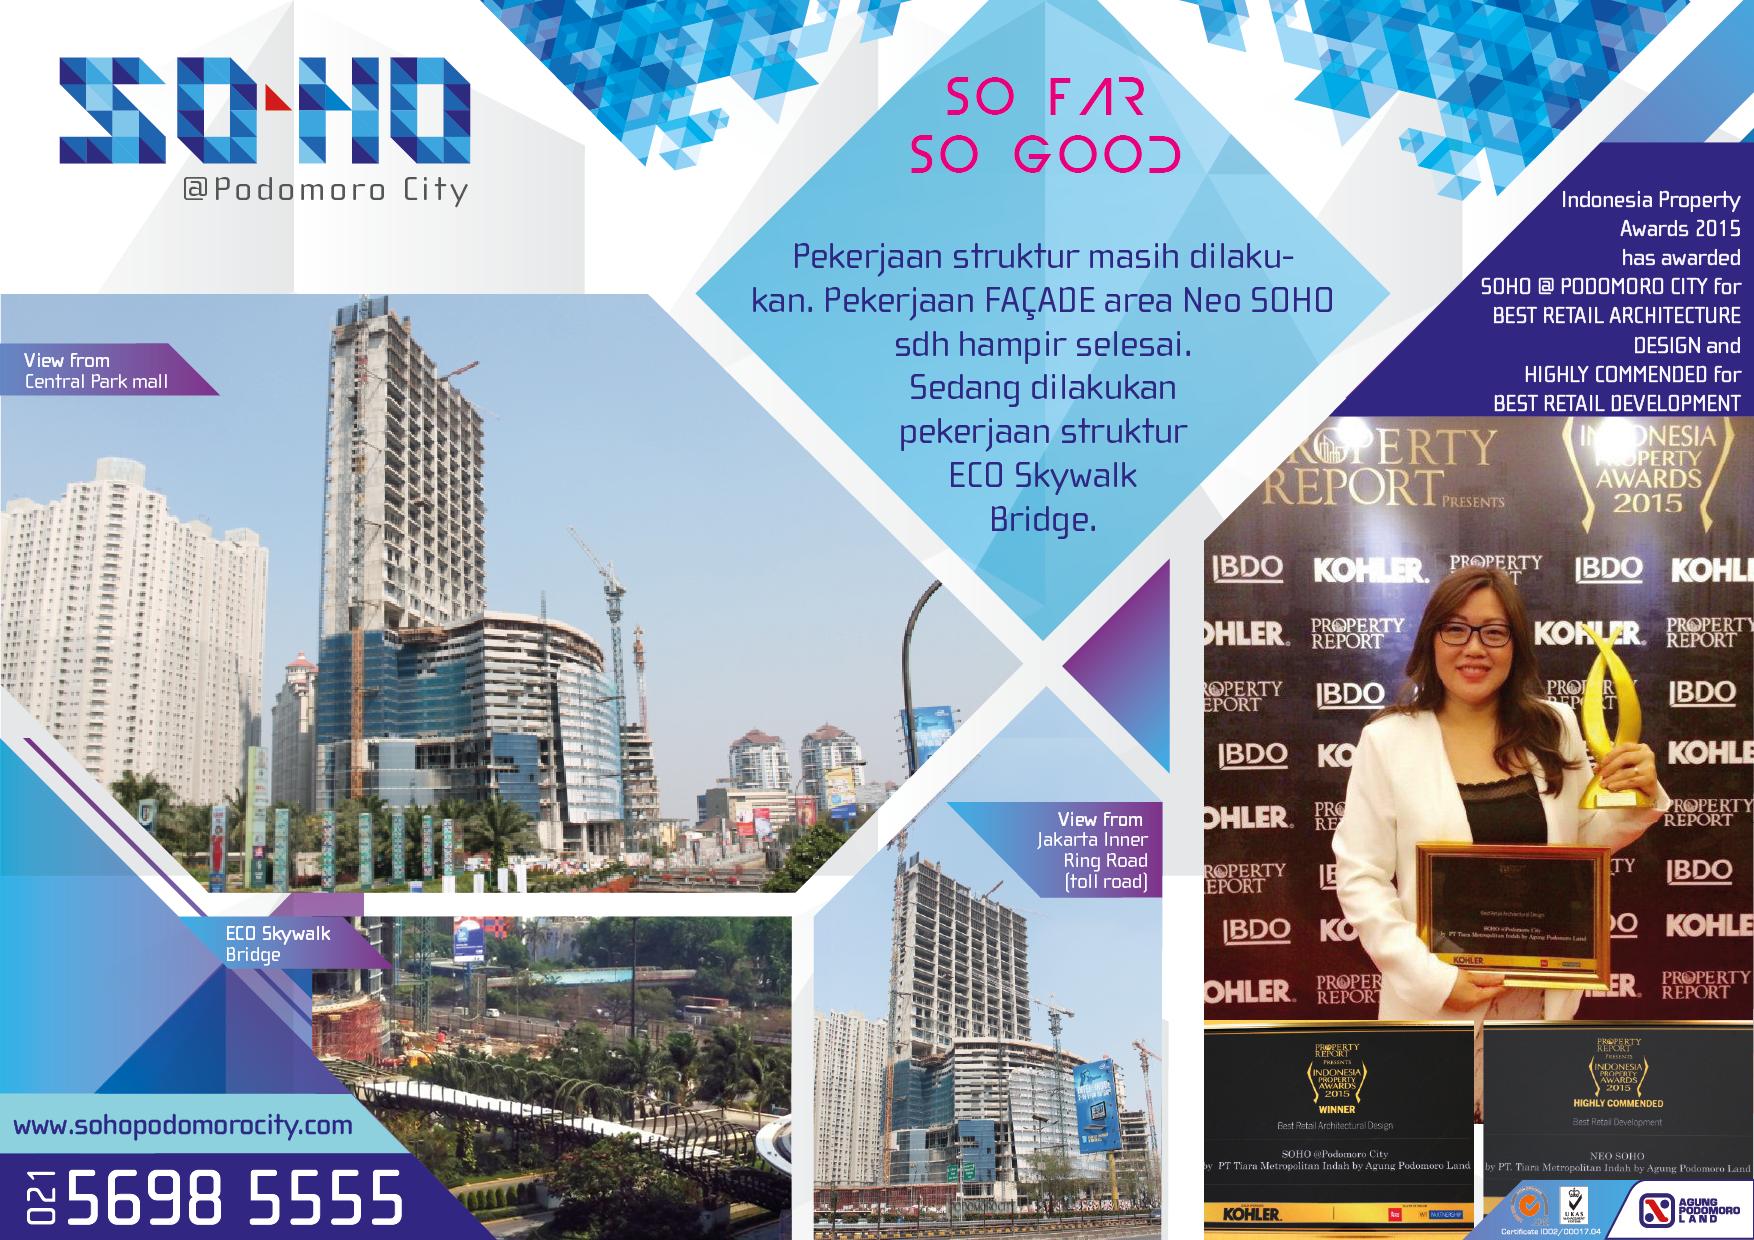 SOHO Podomoro City e-Newsletter (Oct-Dec)-02